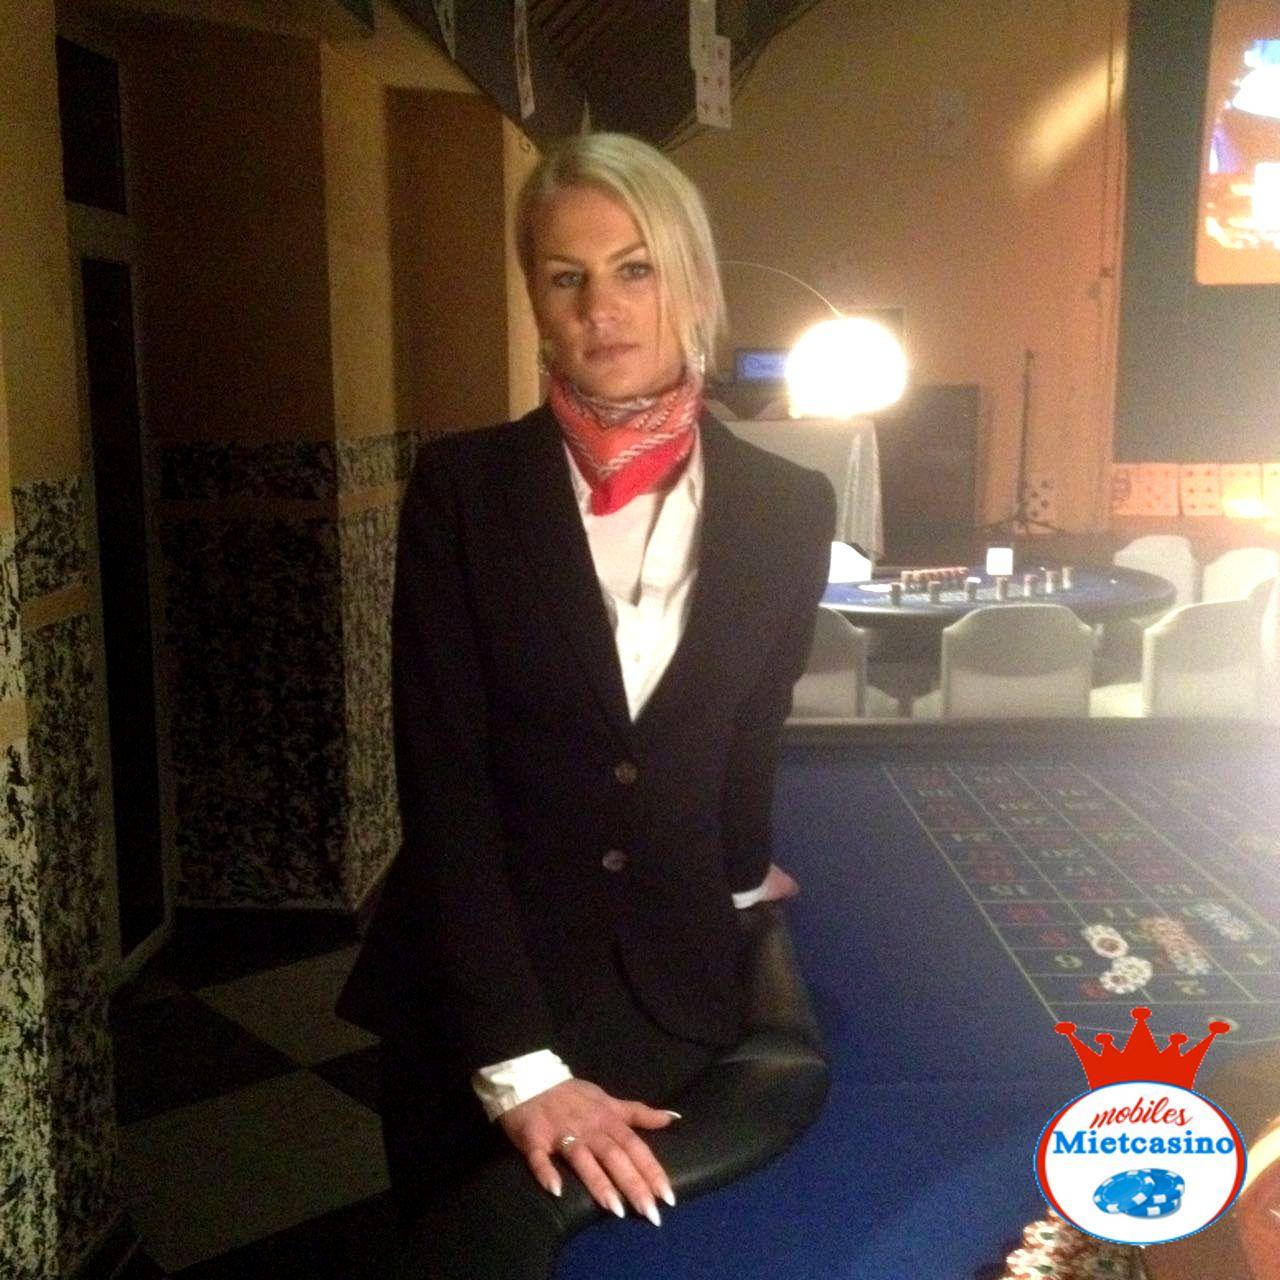 American Roulette Casino Spieltische mit Roulette Kessel  Roulette Croupier